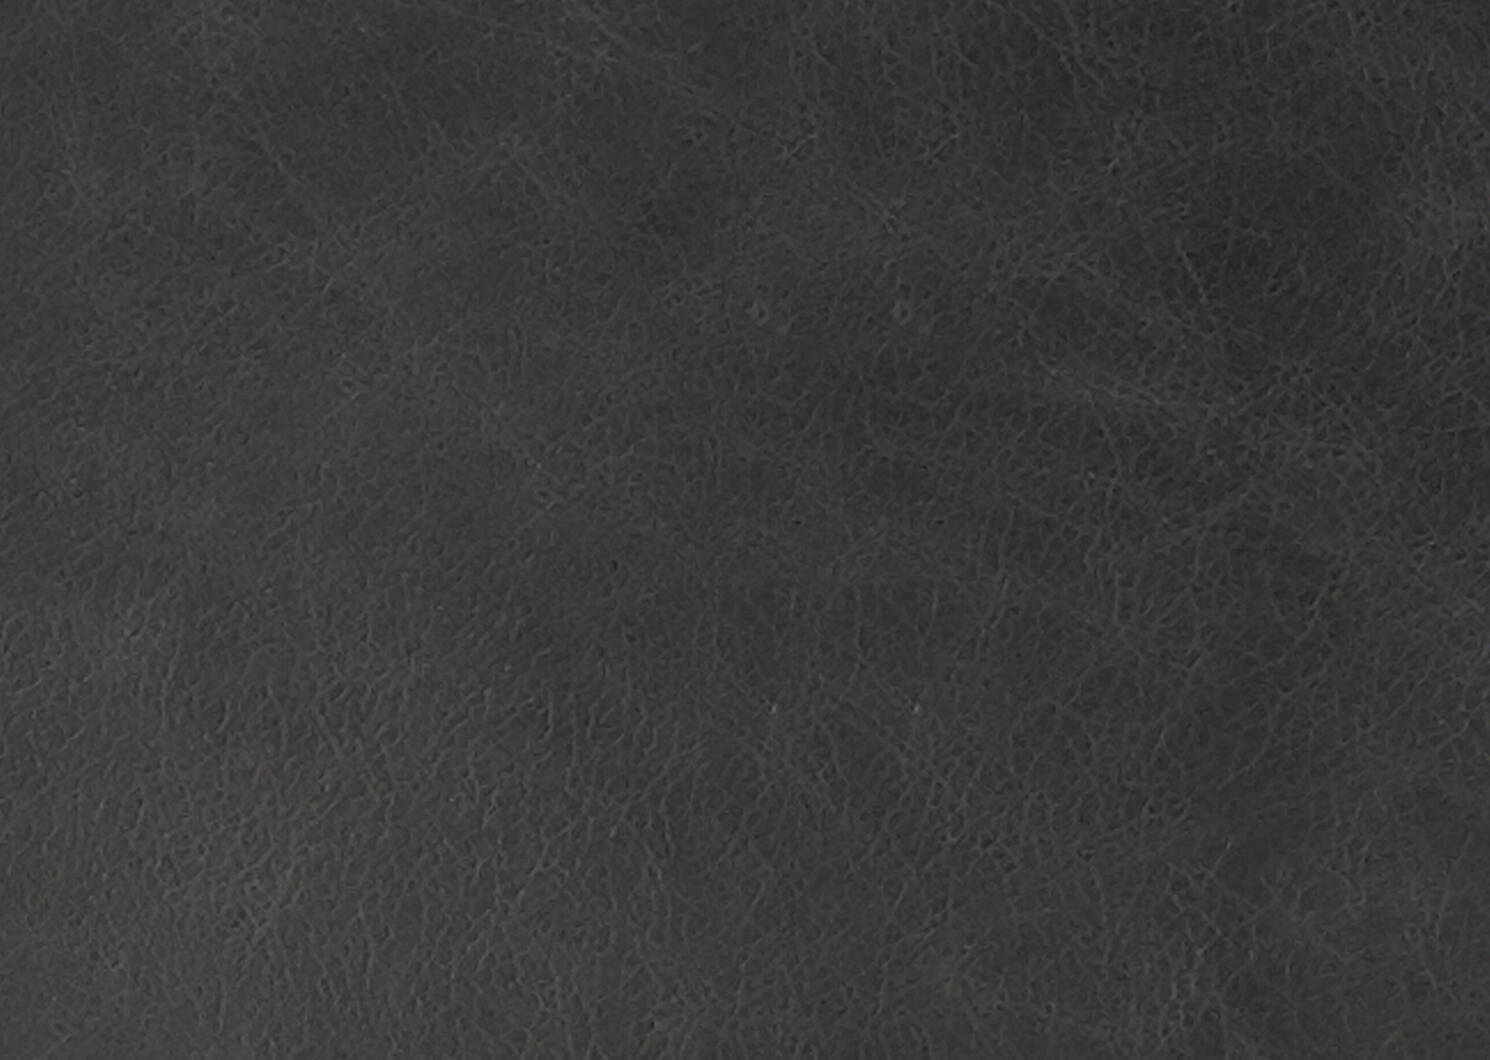 Fauteuil en cuir Diablo -Harrod charbon